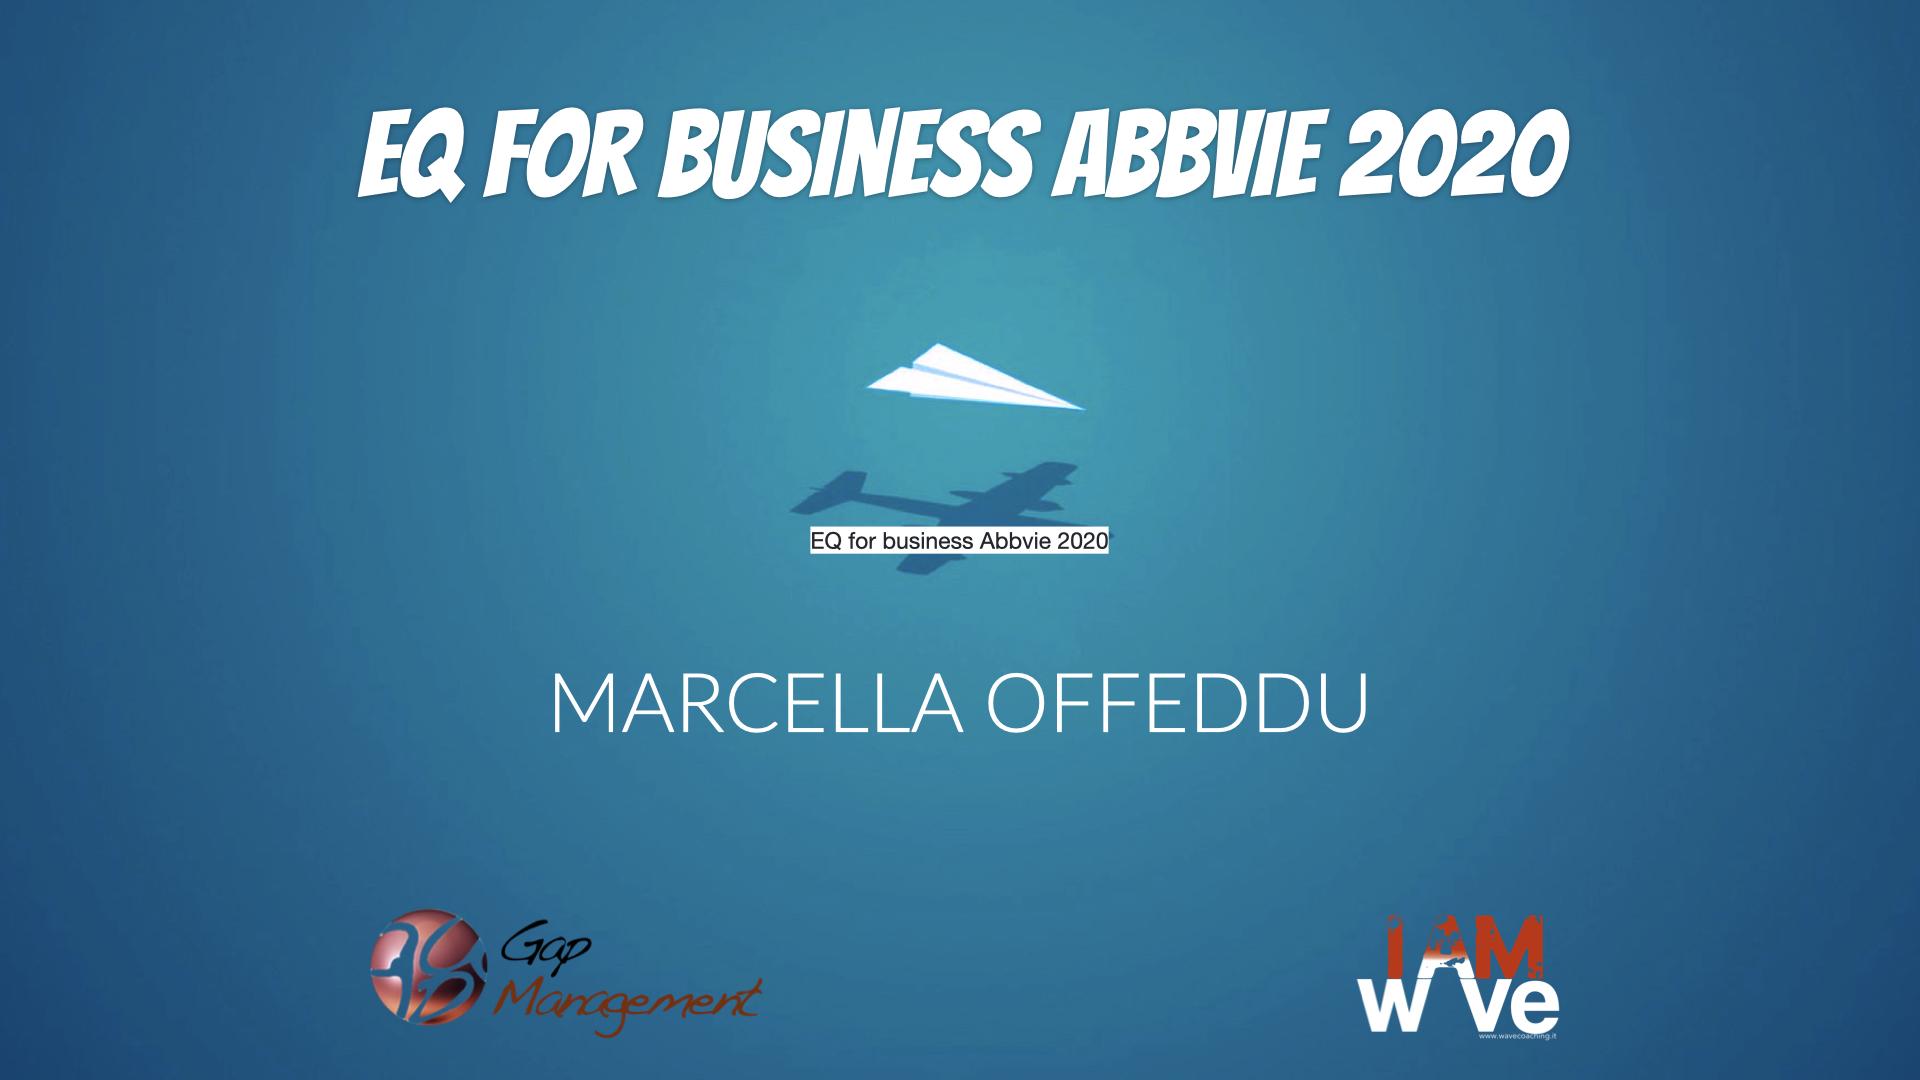 EQ for business Abbvie 2020